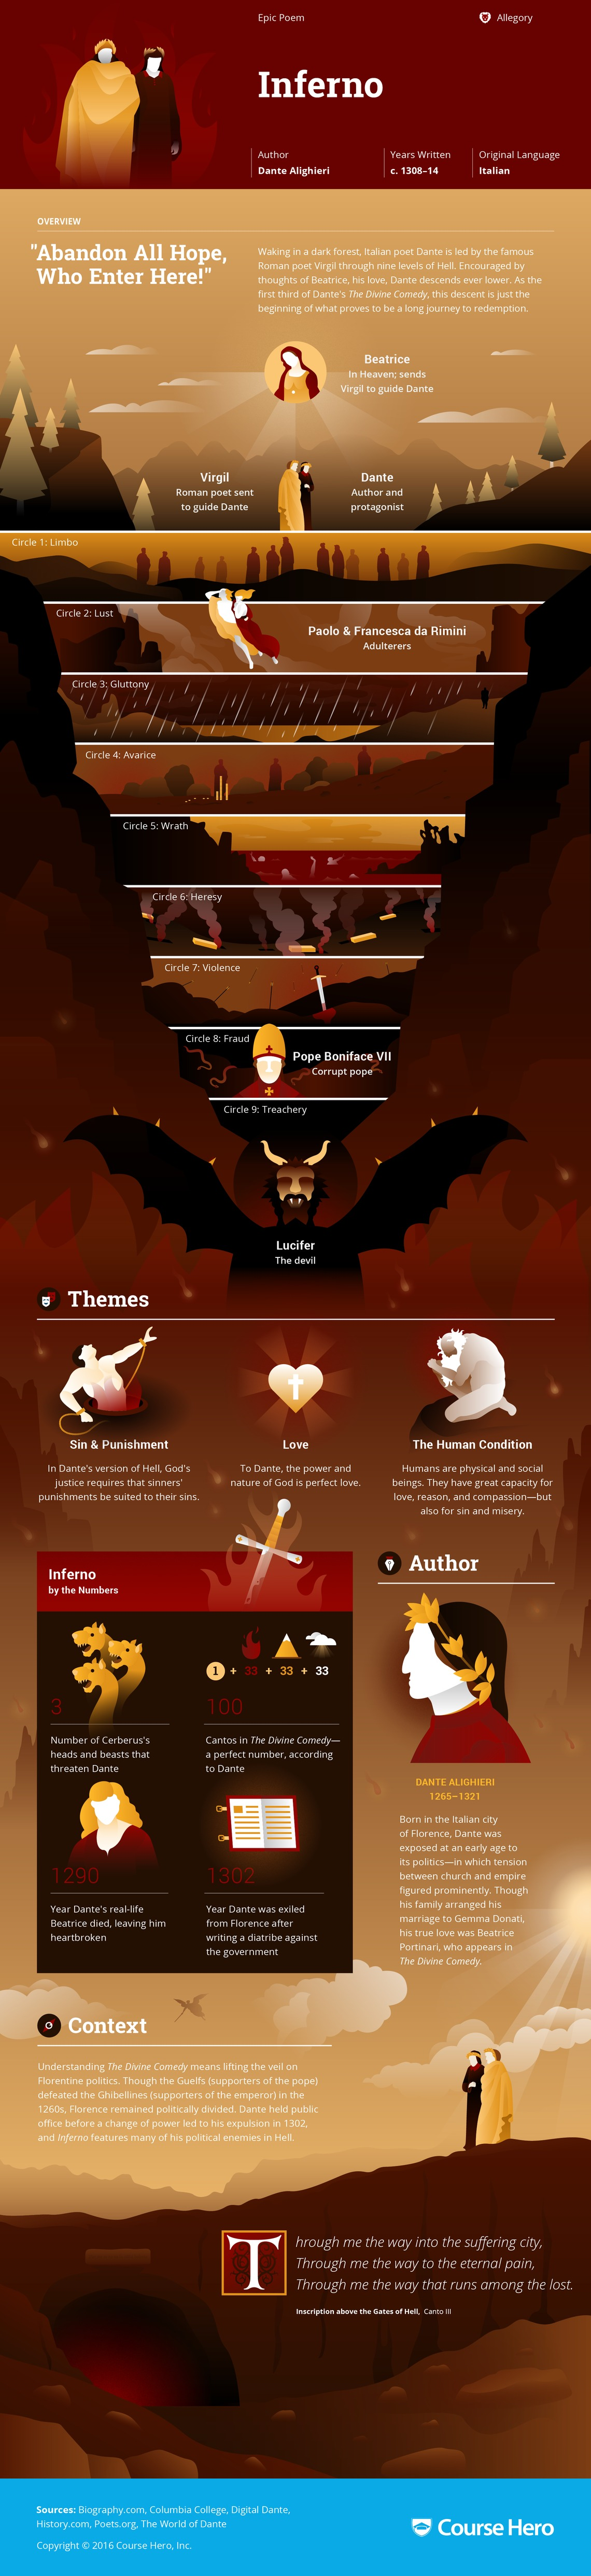 Literary analysis on the inferno